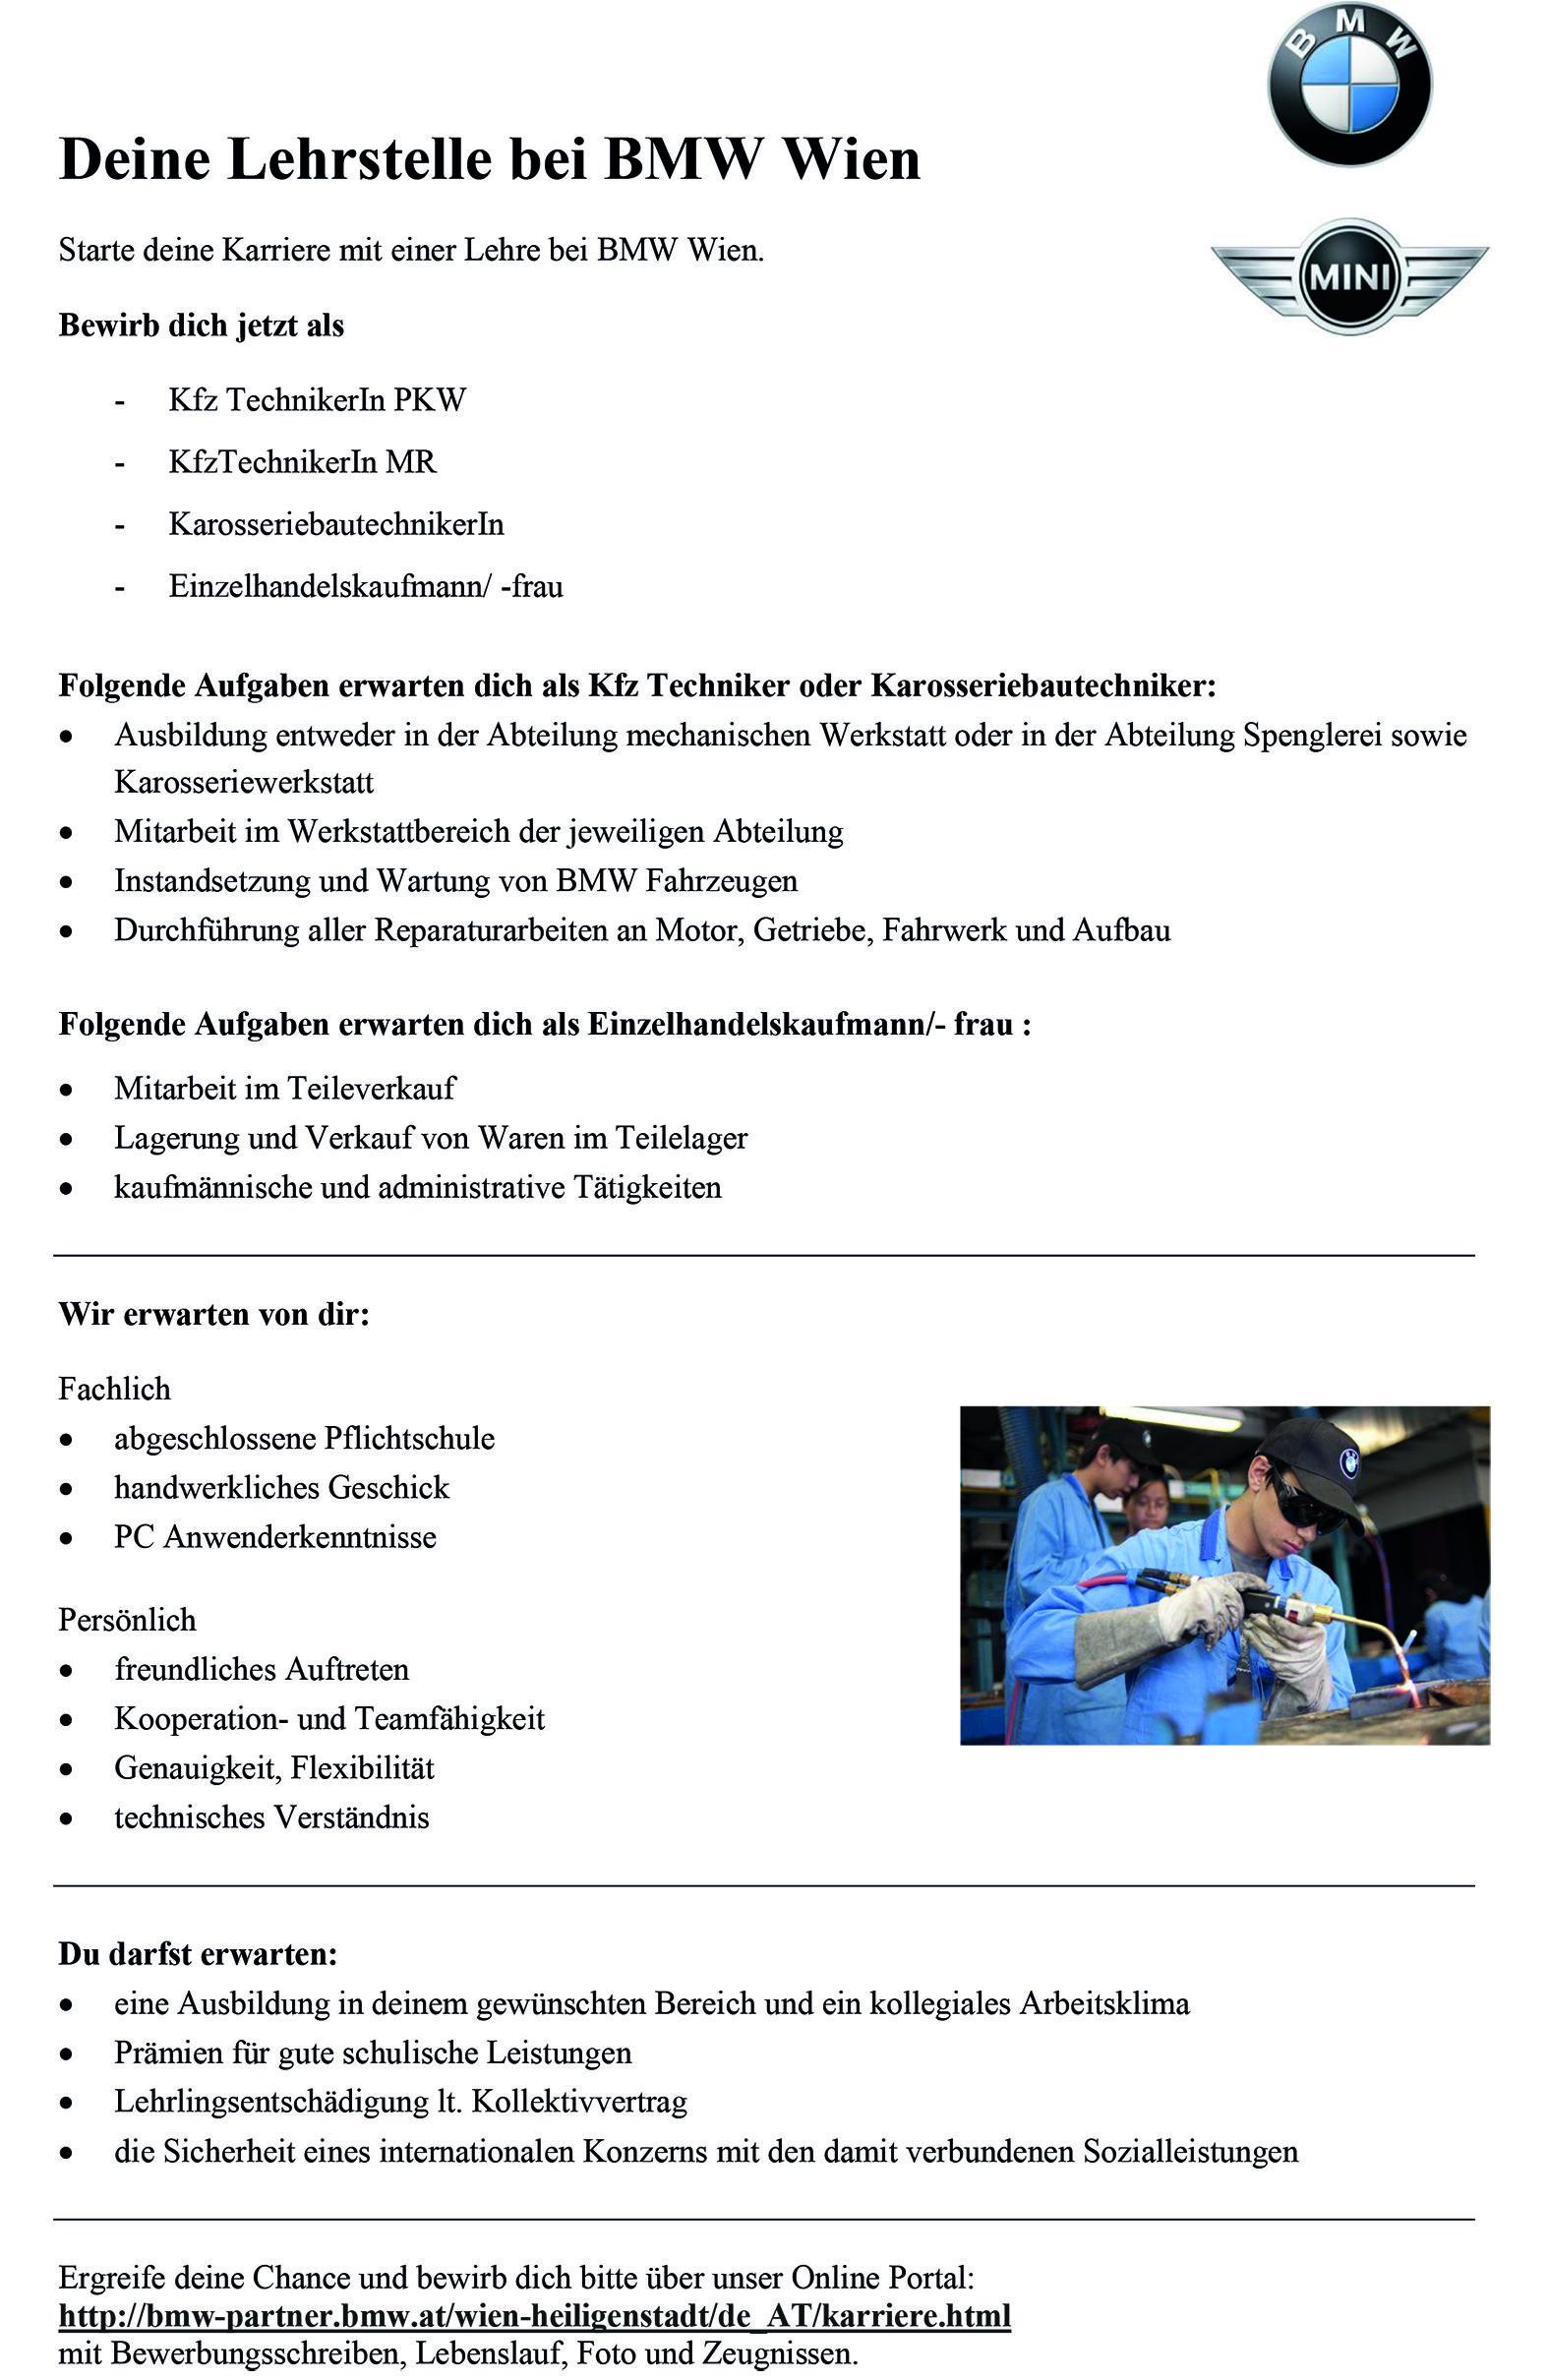 Www Http Bmw Partner Bmw At Wien Heiligenstadt De At Karriere Html Lehrstellen Lehrling Techniker